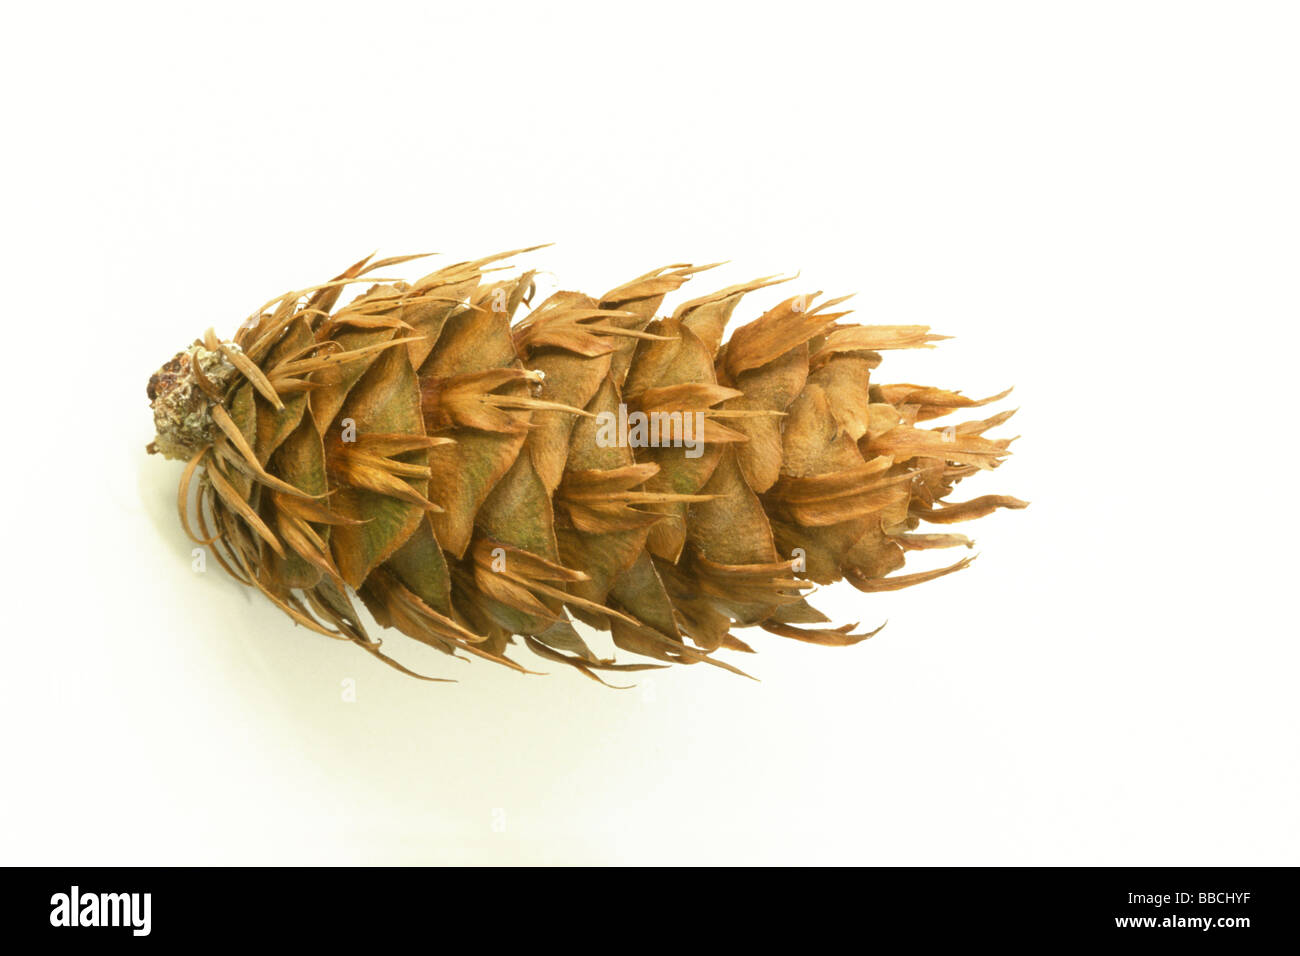 Douglas Fir (Pseudotsuga menziesii, Pseudotsuga douglasii), cone, studio picture - Stock Image